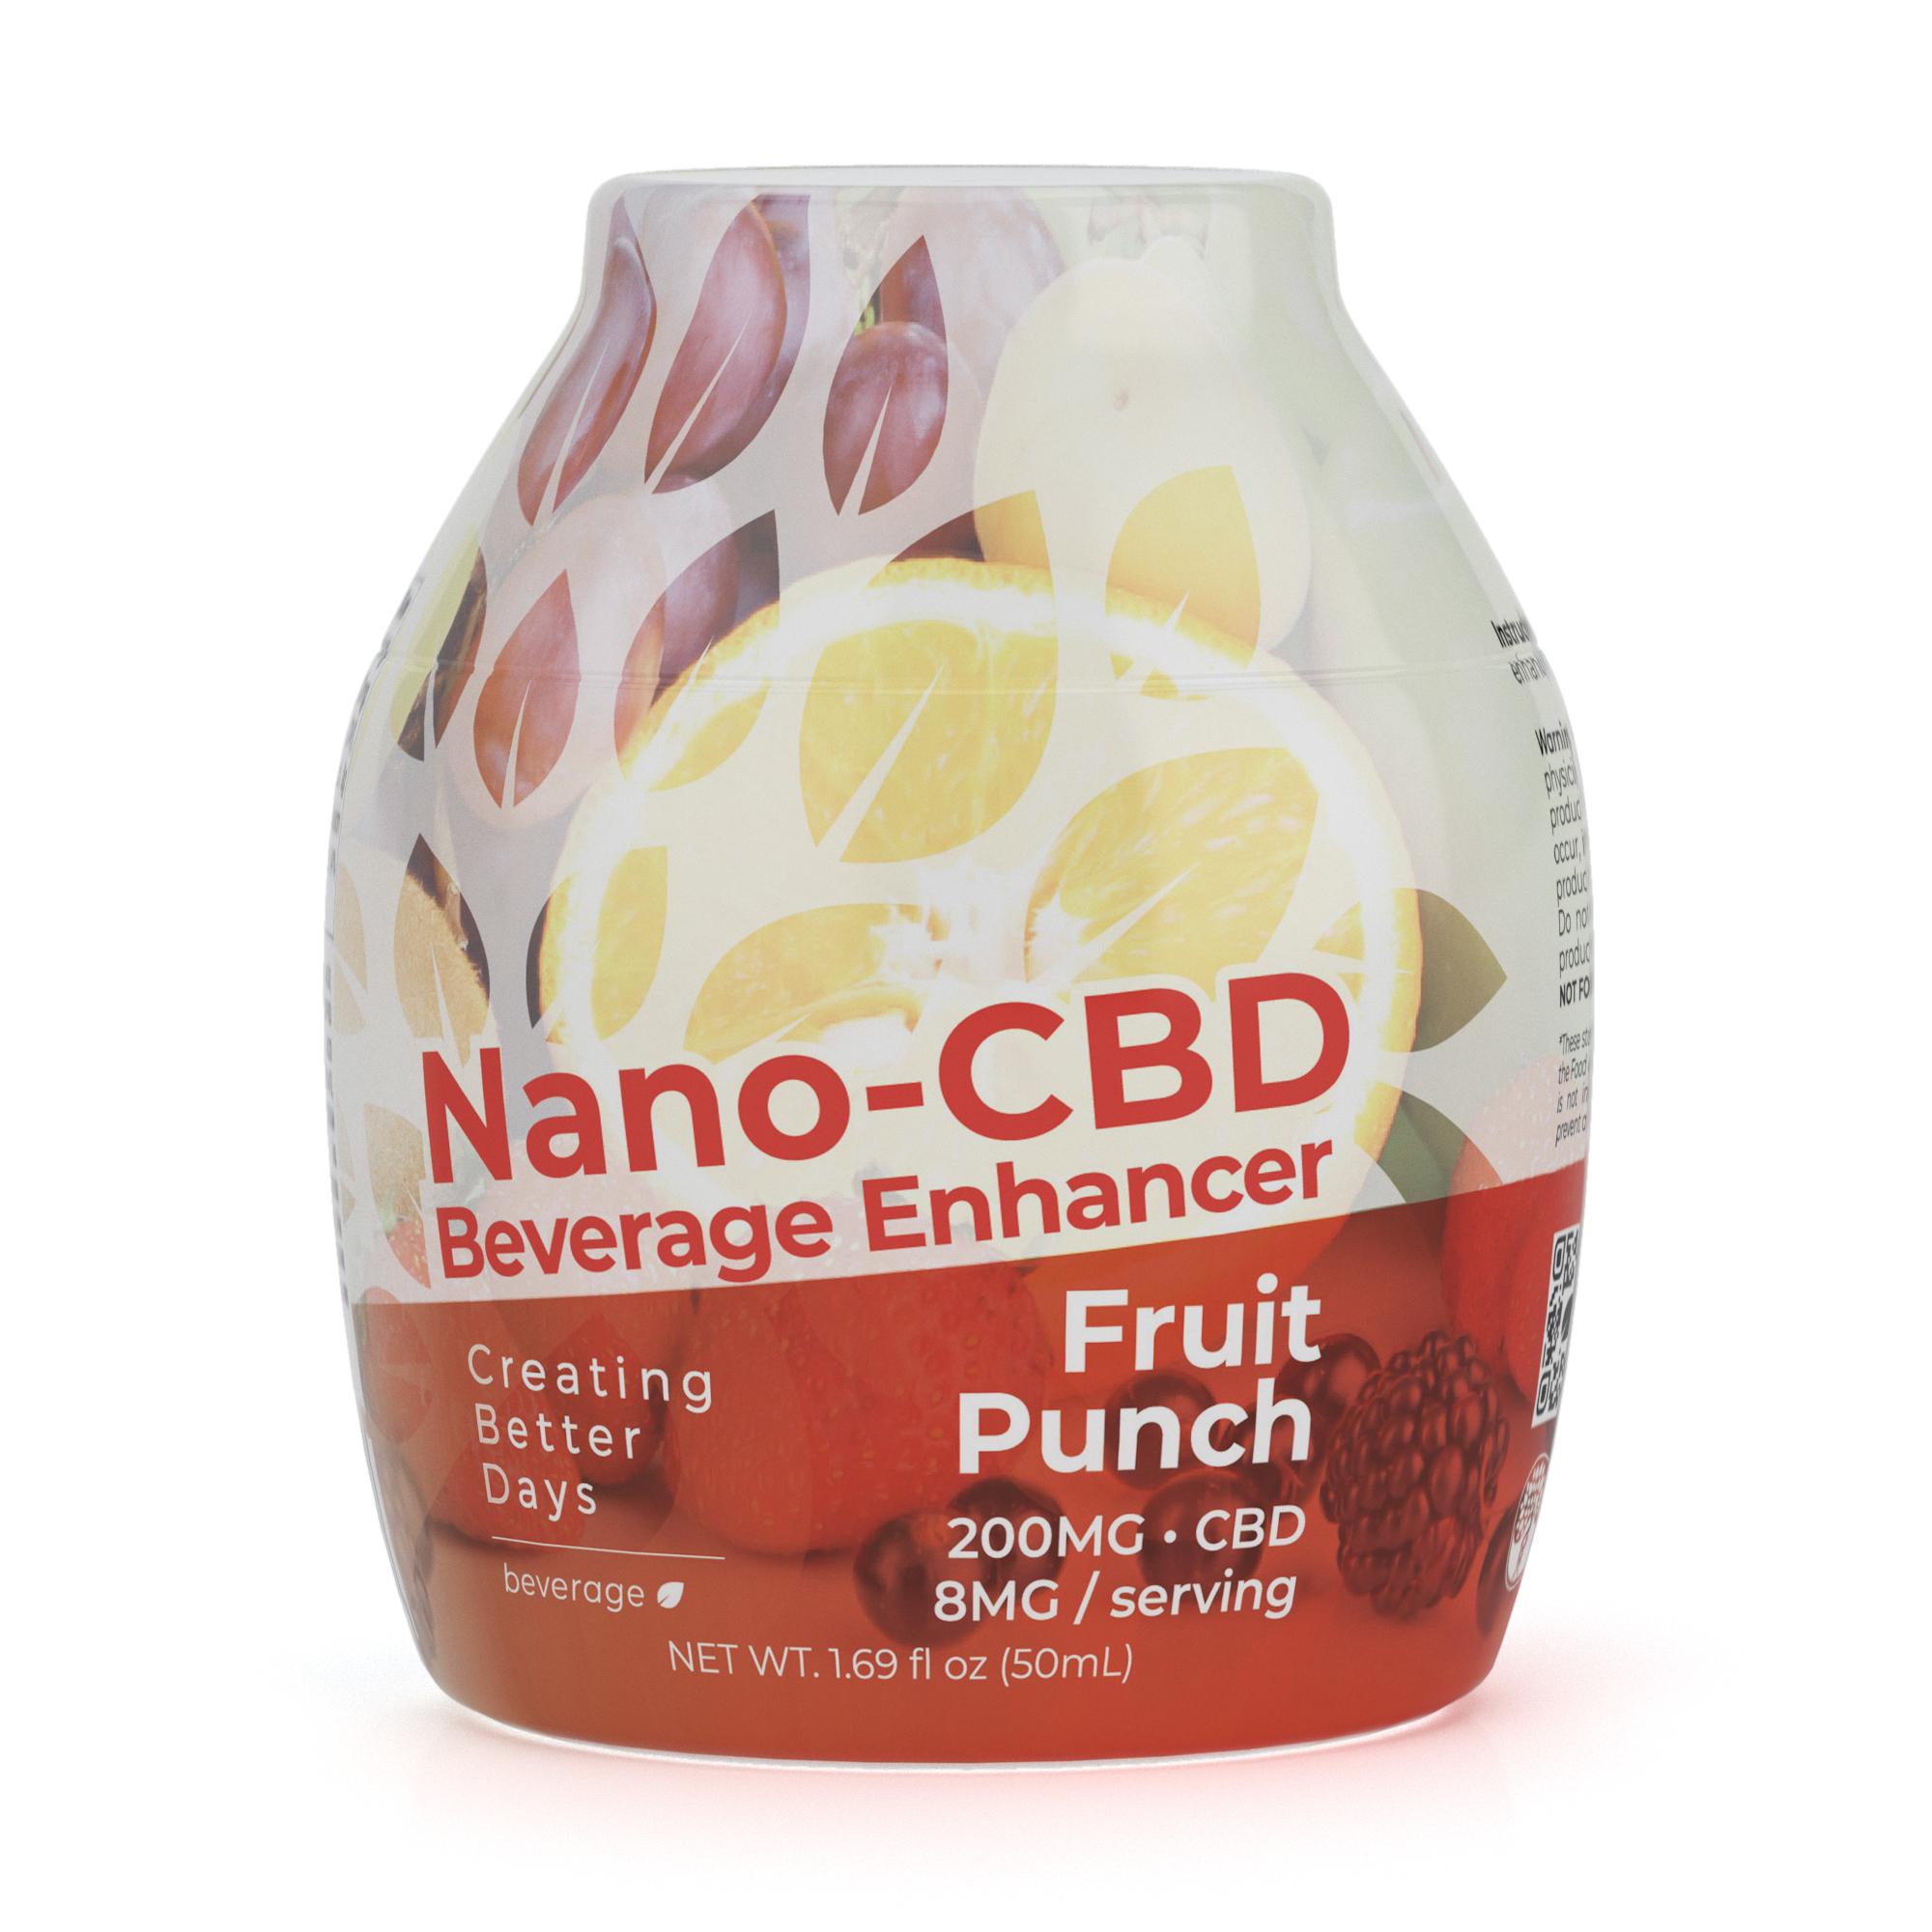 Nano-CBD Beverage Enhancer Fruit Punch 200MG 00060